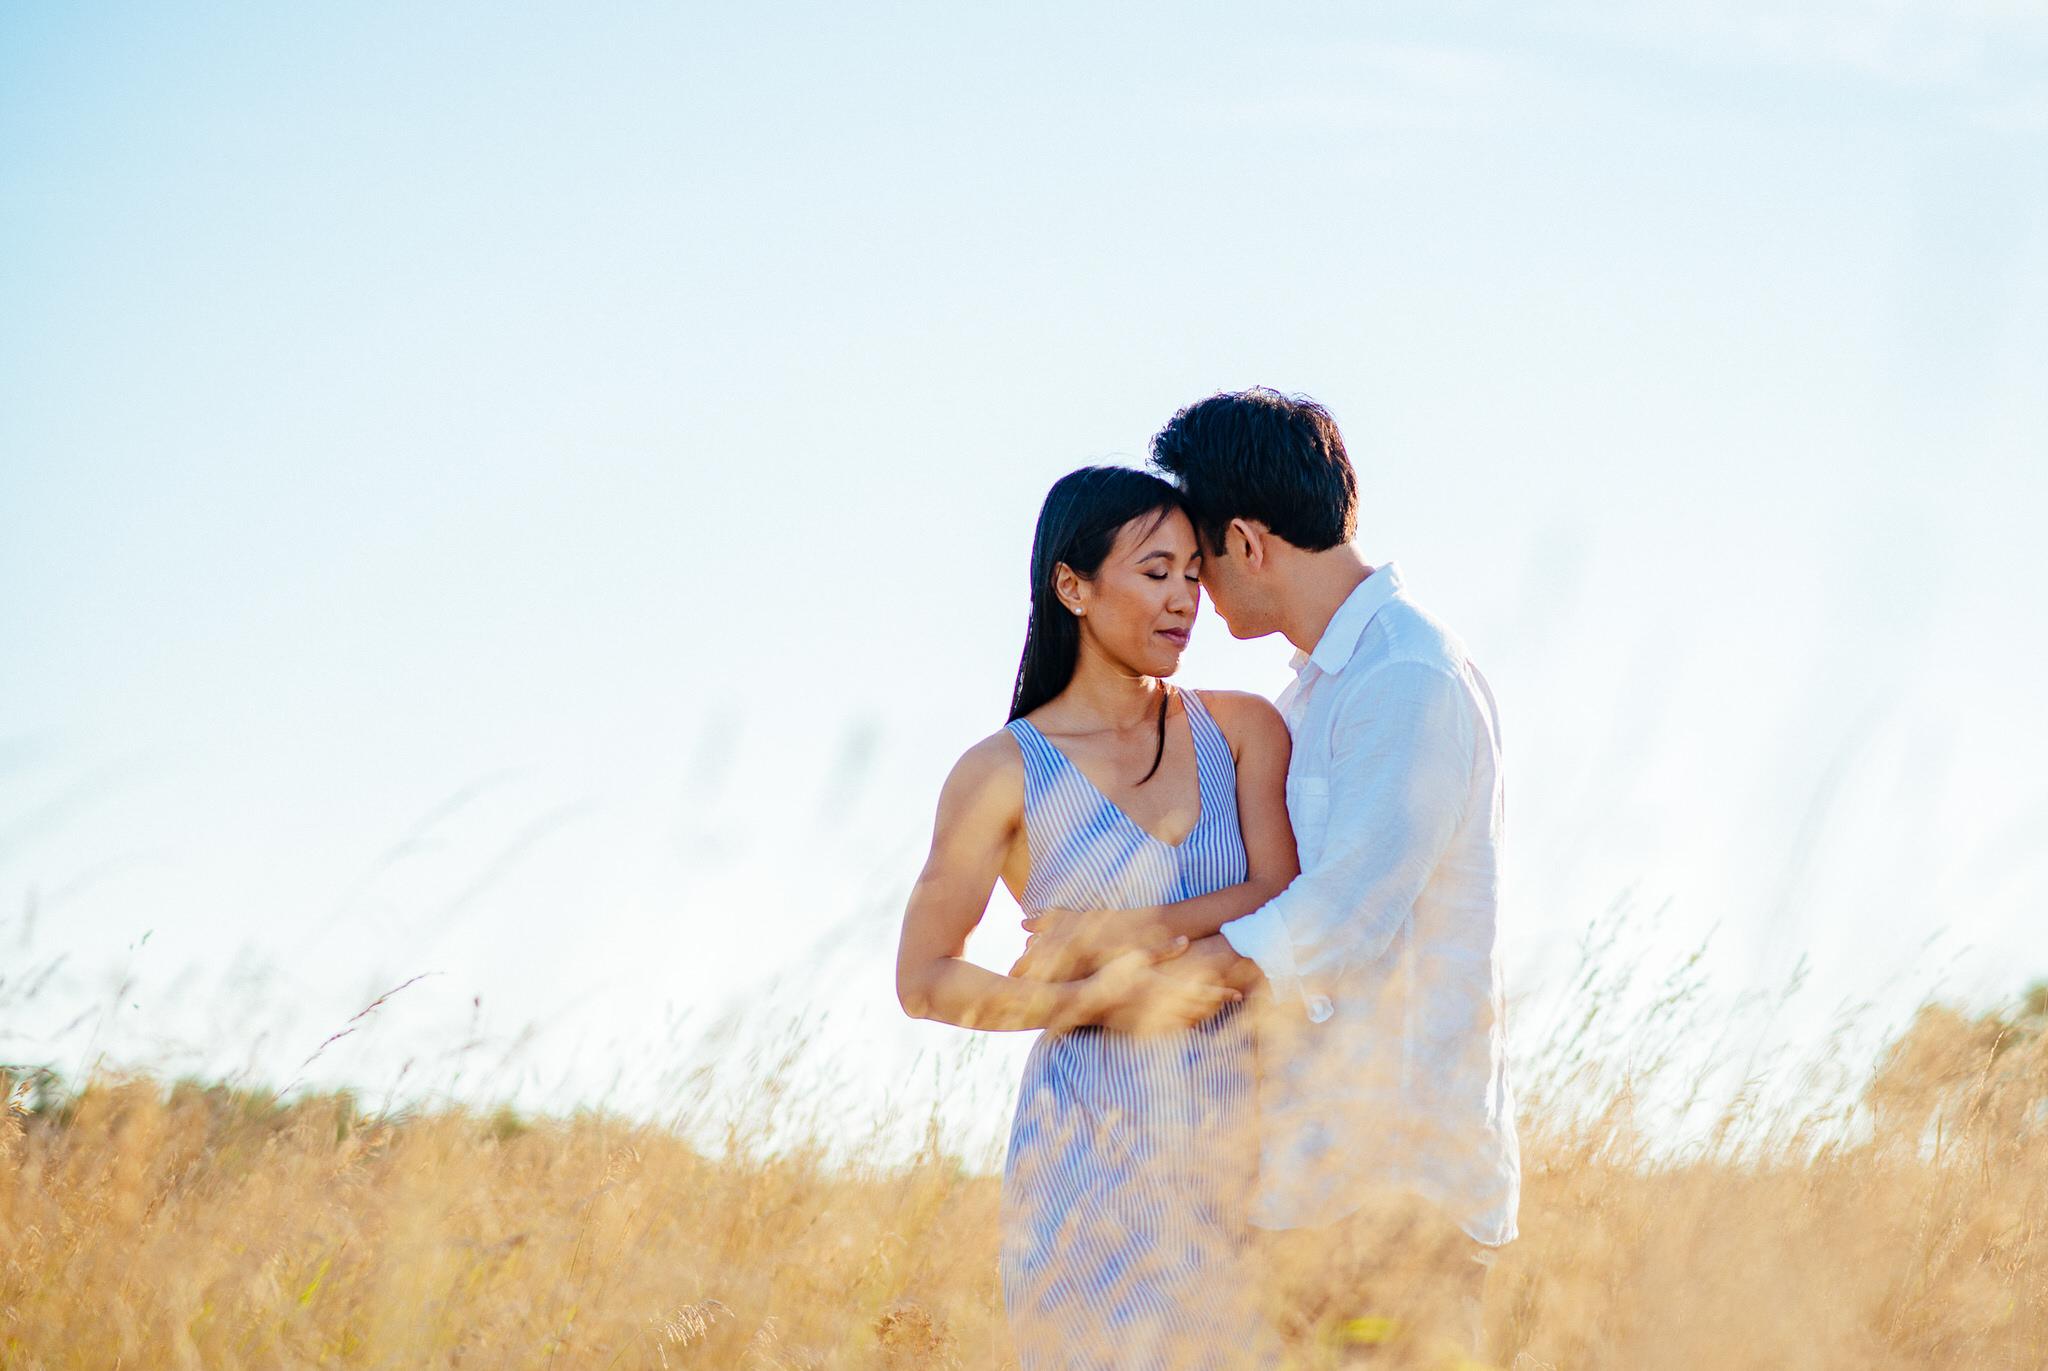 D+&+J+Wedding-7483.jpg